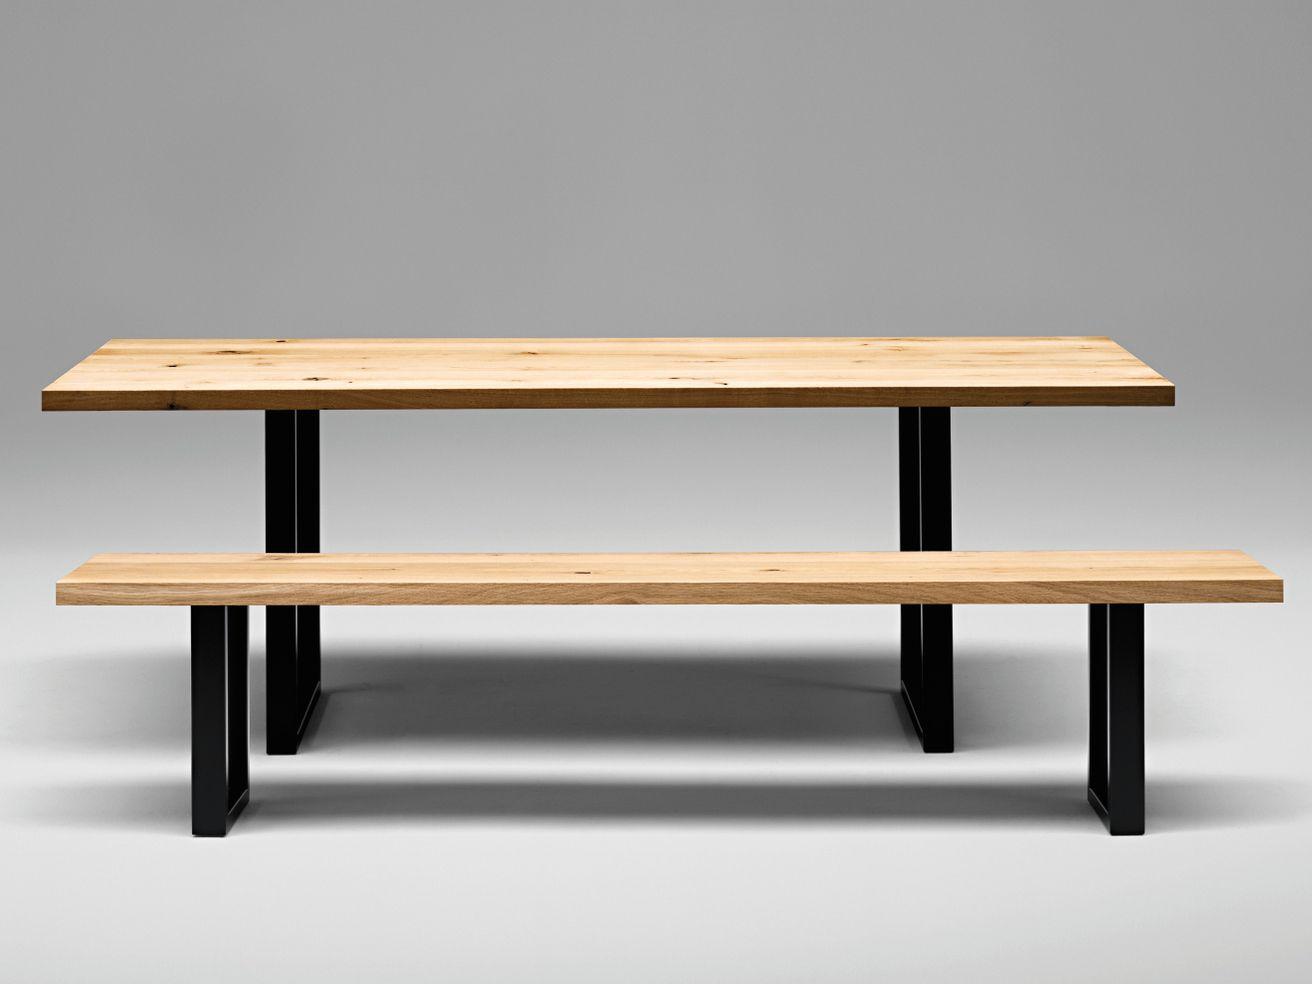 sc25 metall tisch aus holz by janua design christian seisenberger. Black Bedroom Furniture Sets. Home Design Ideas